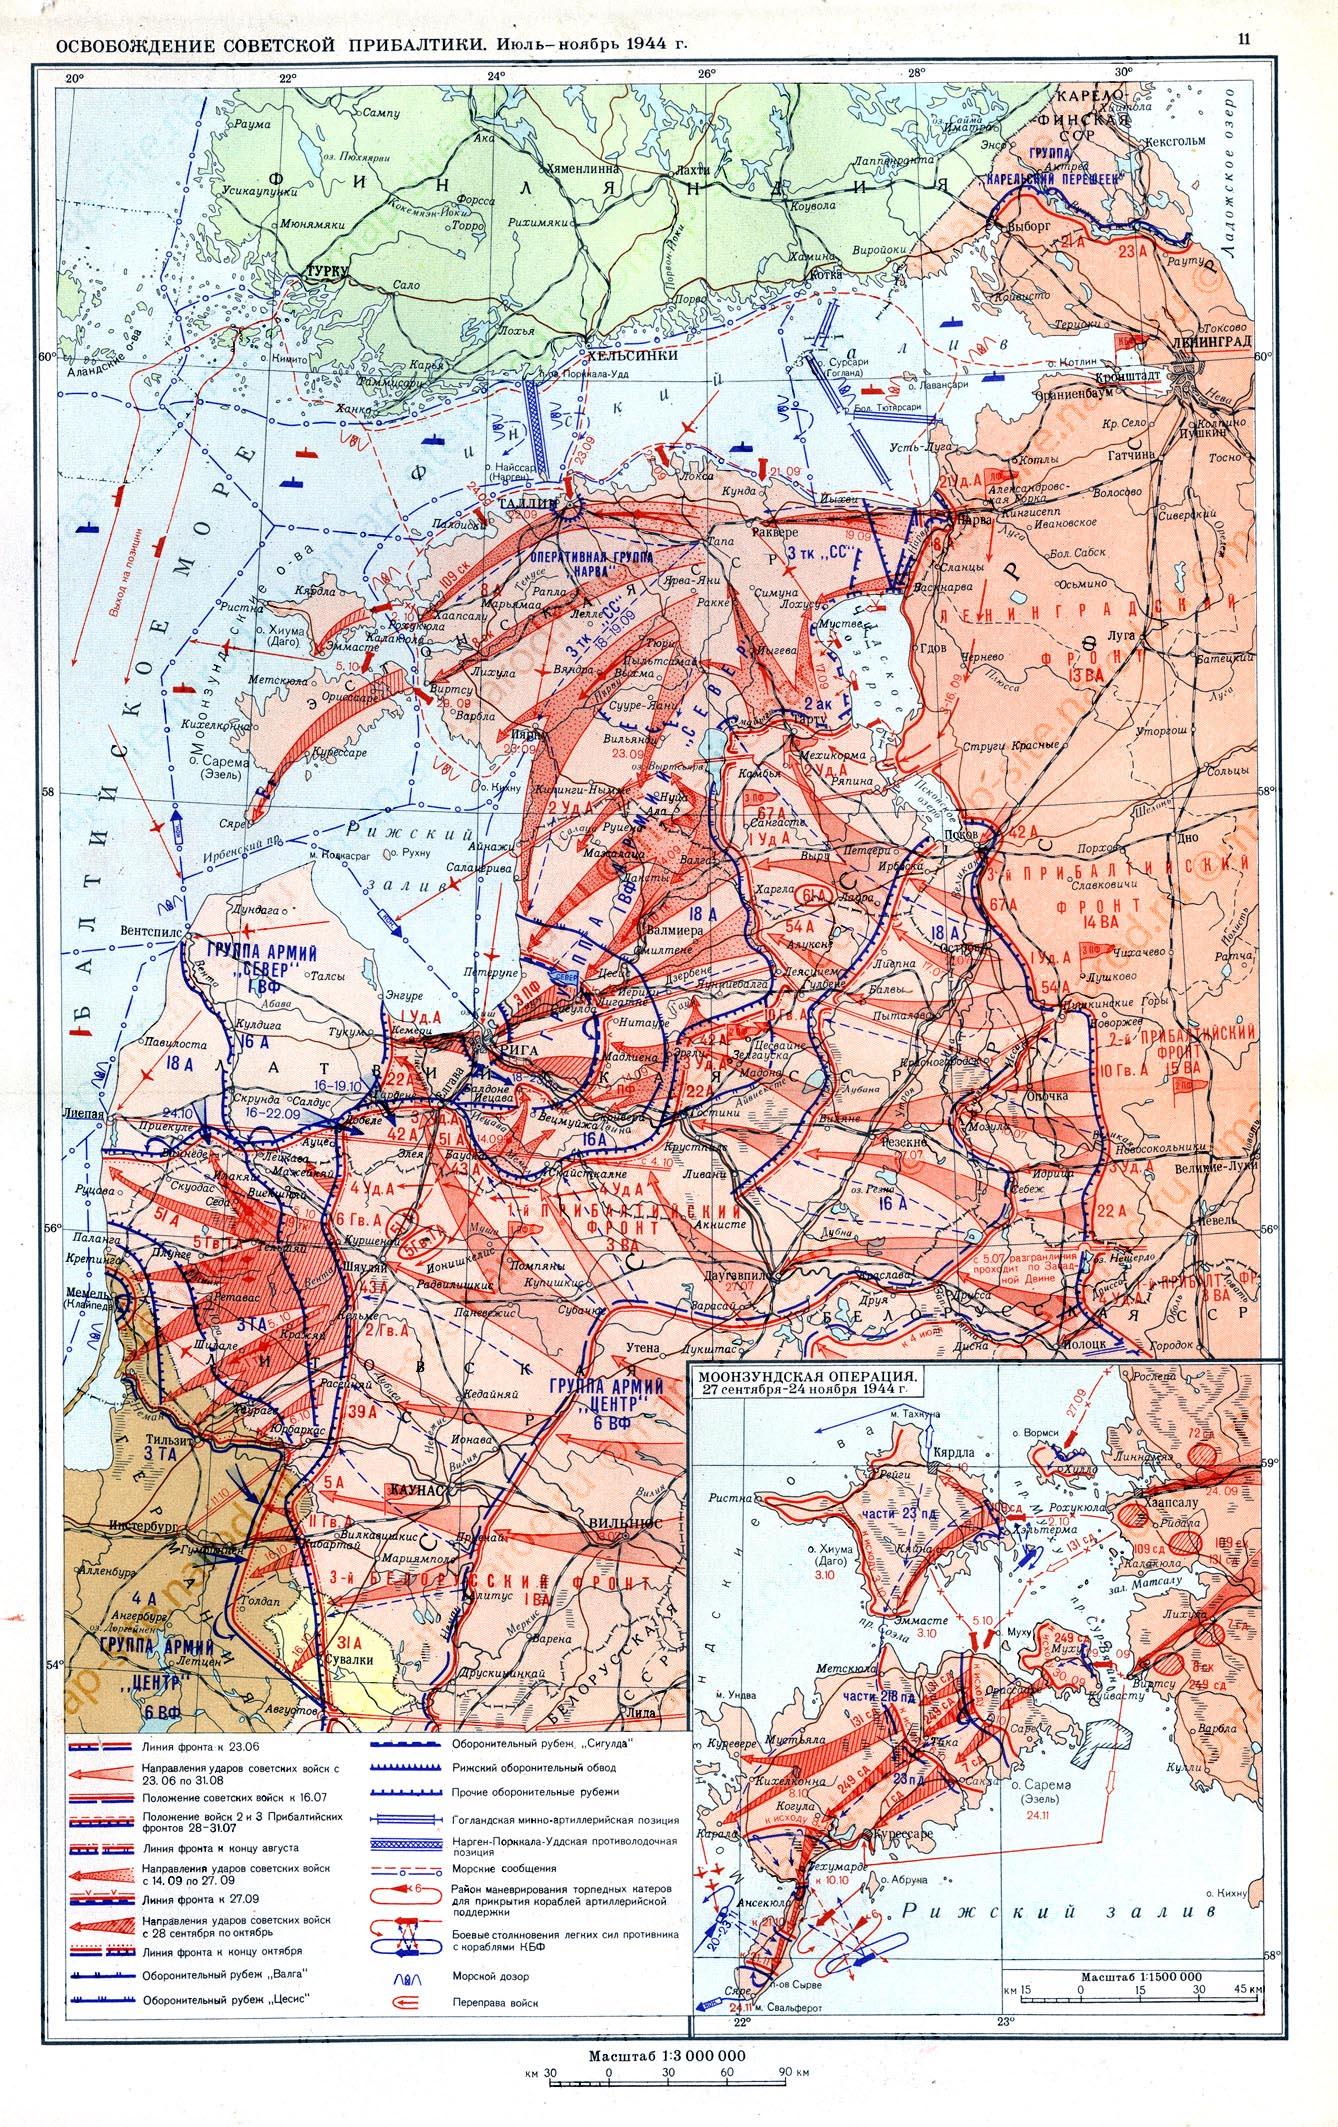 http://map-site.narod.ru/osvobpribaltika-1.jpg